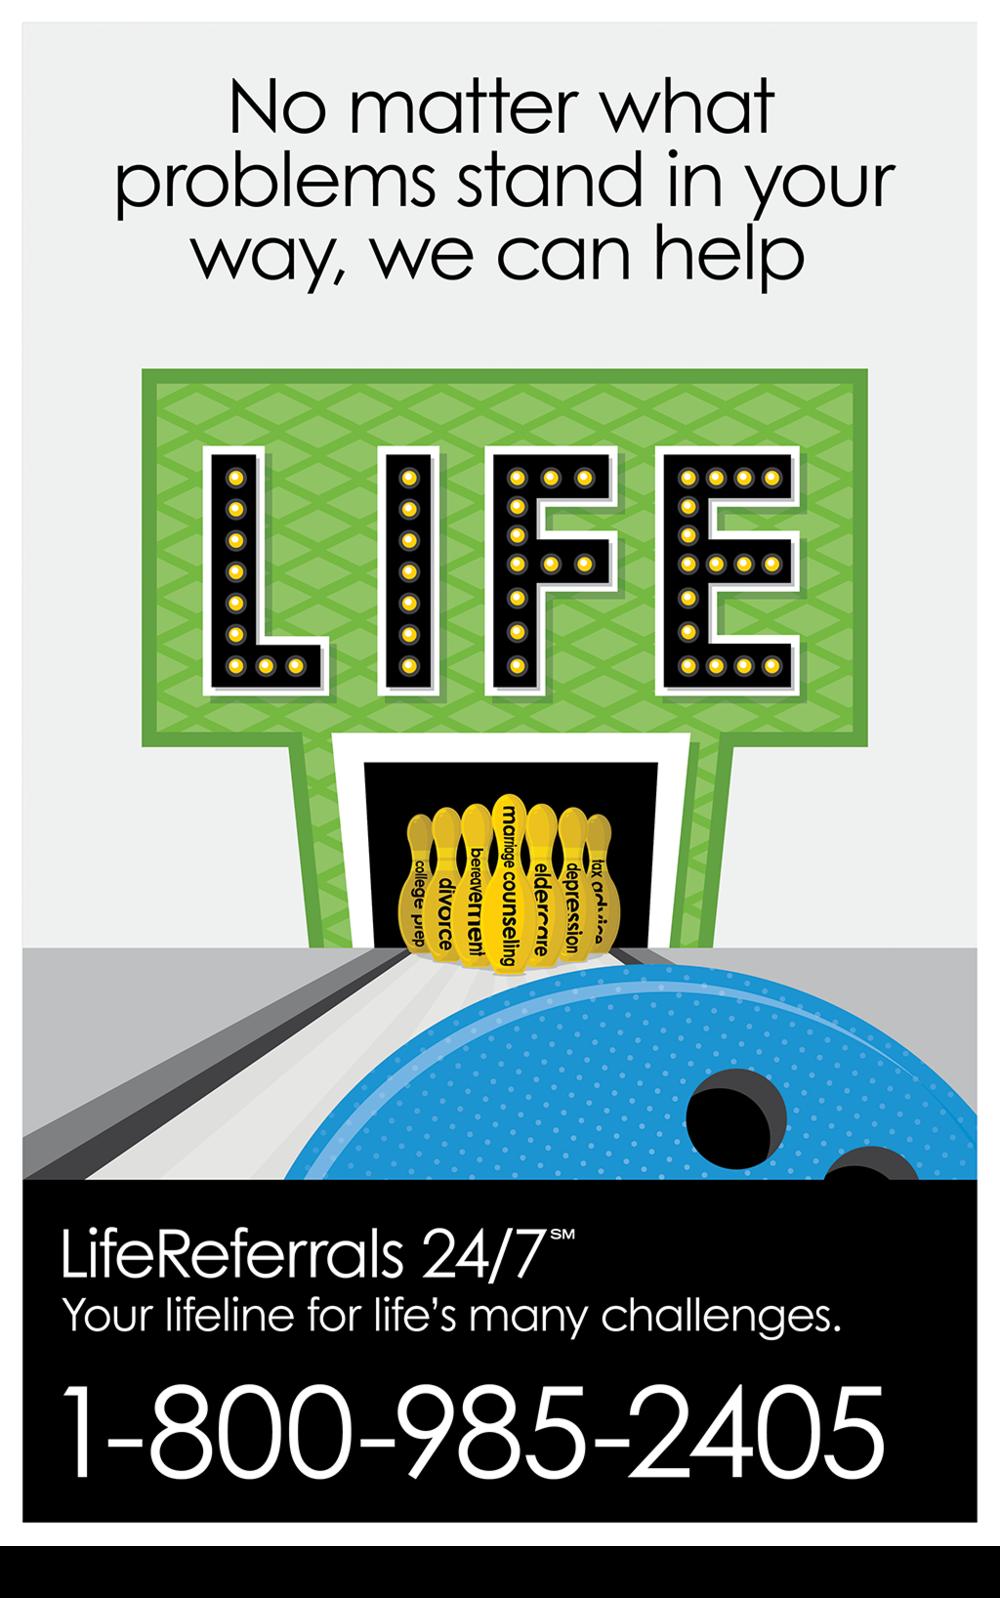 LifeReferrals_Poster2_1024x1582.jpg